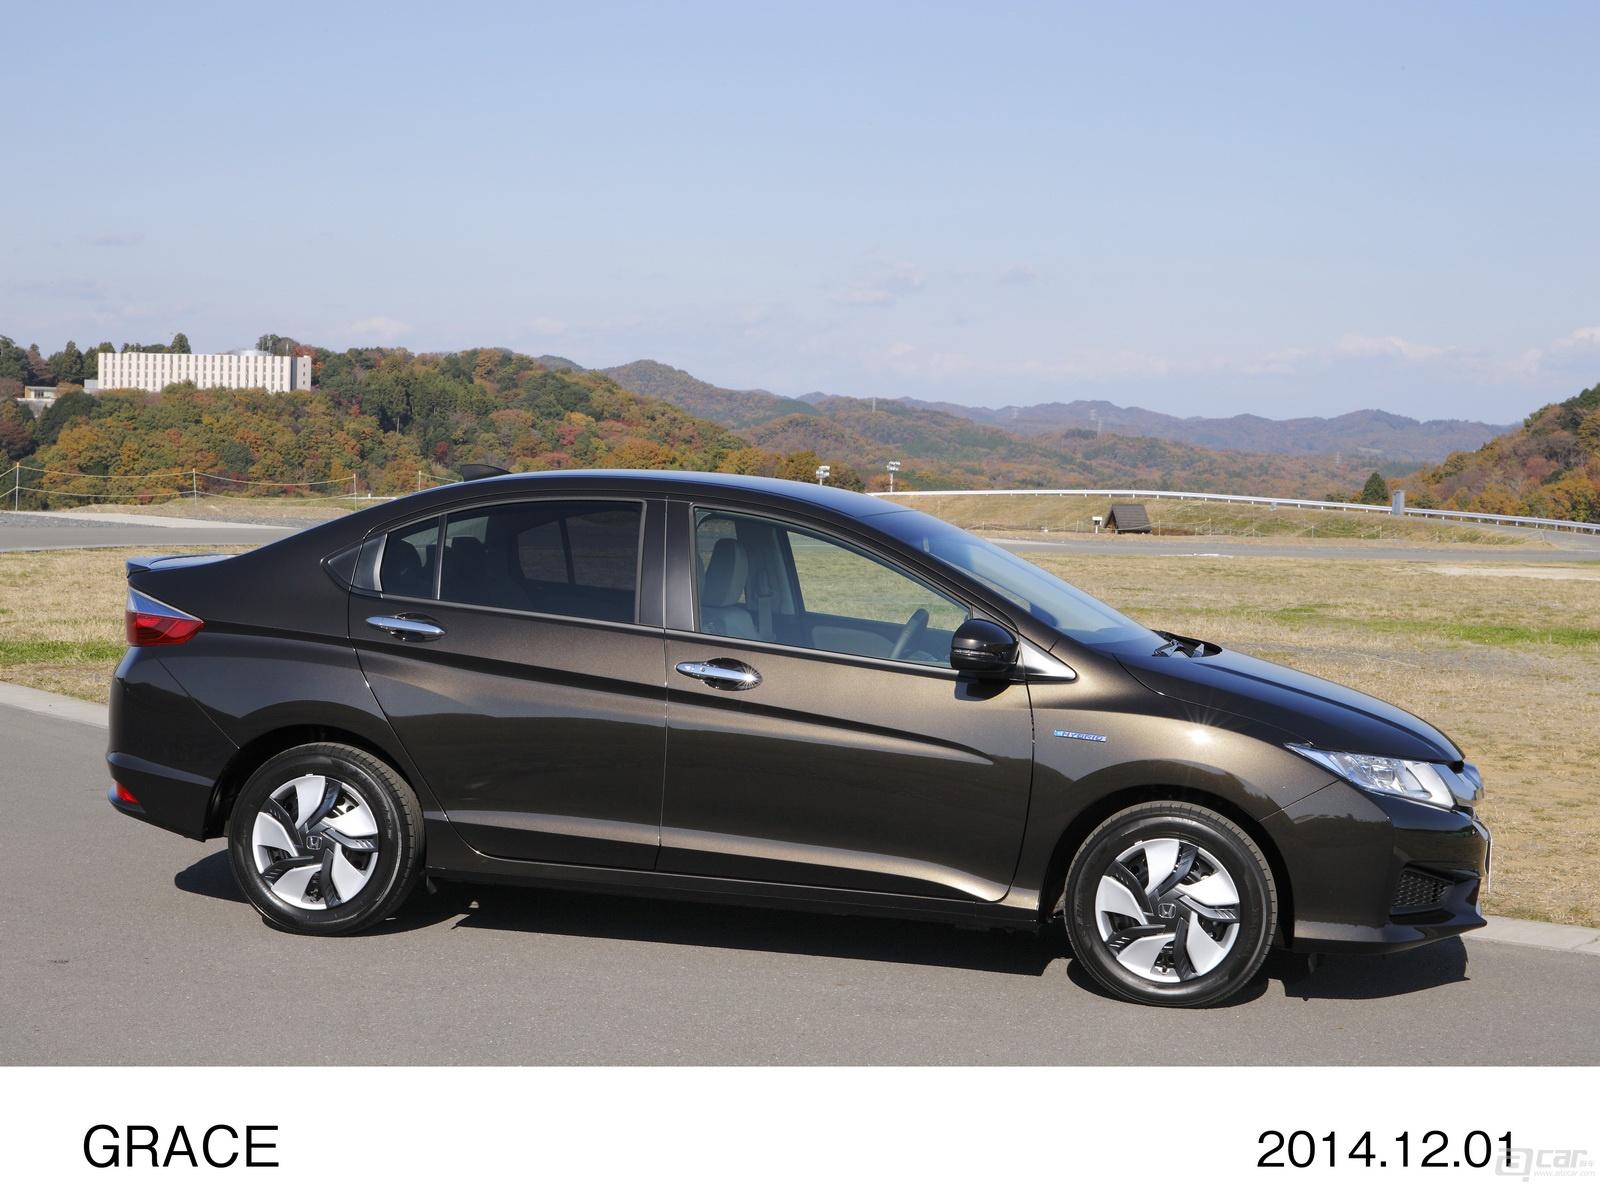 00025_honda-grace-hybrid-25